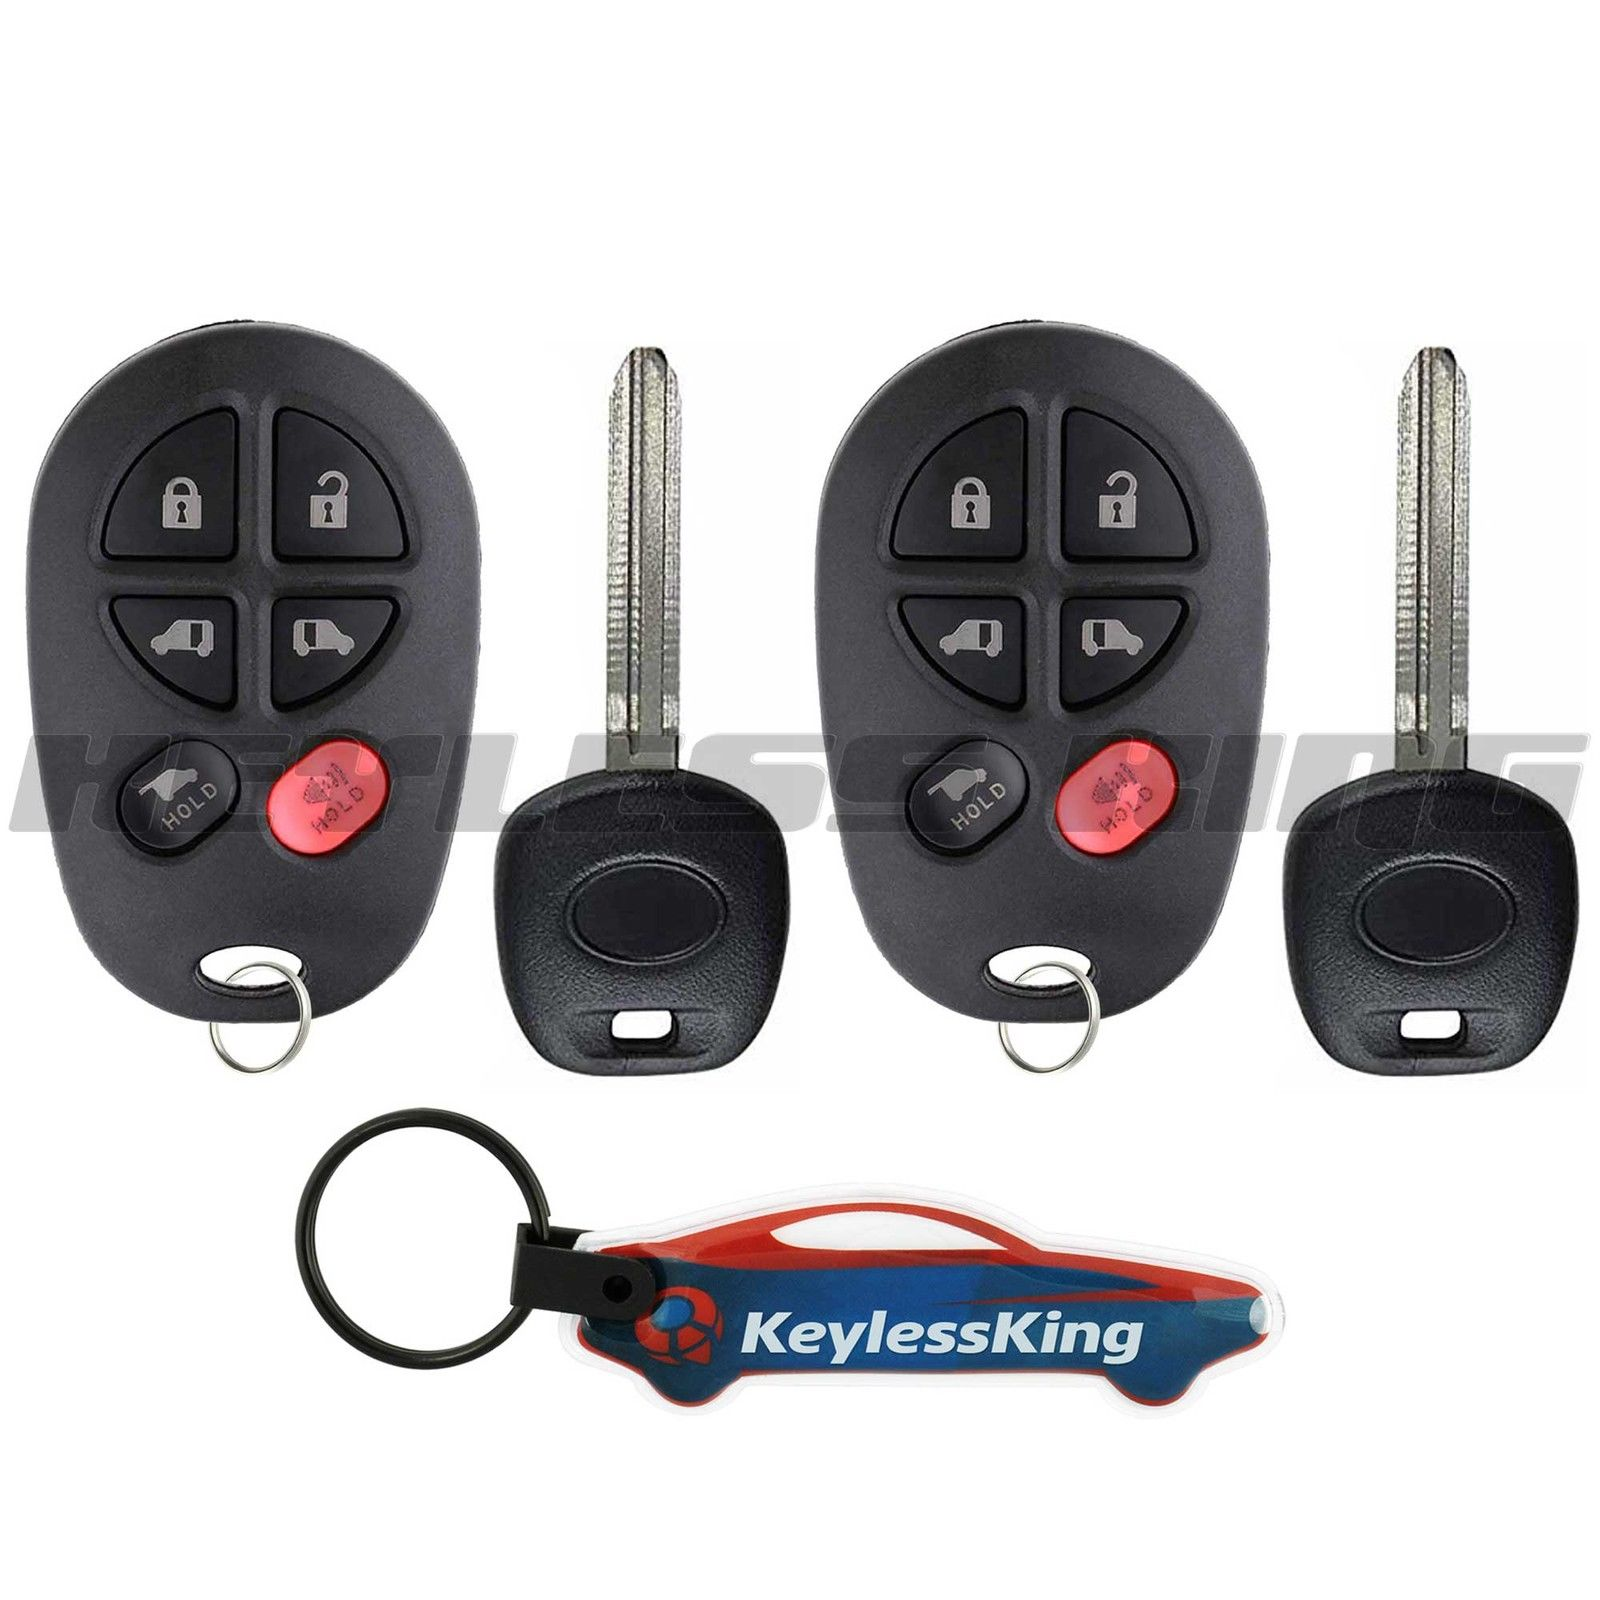 Parts & Accessories Remote Entry System Kits ganesh.dp.ua 2 Car ...